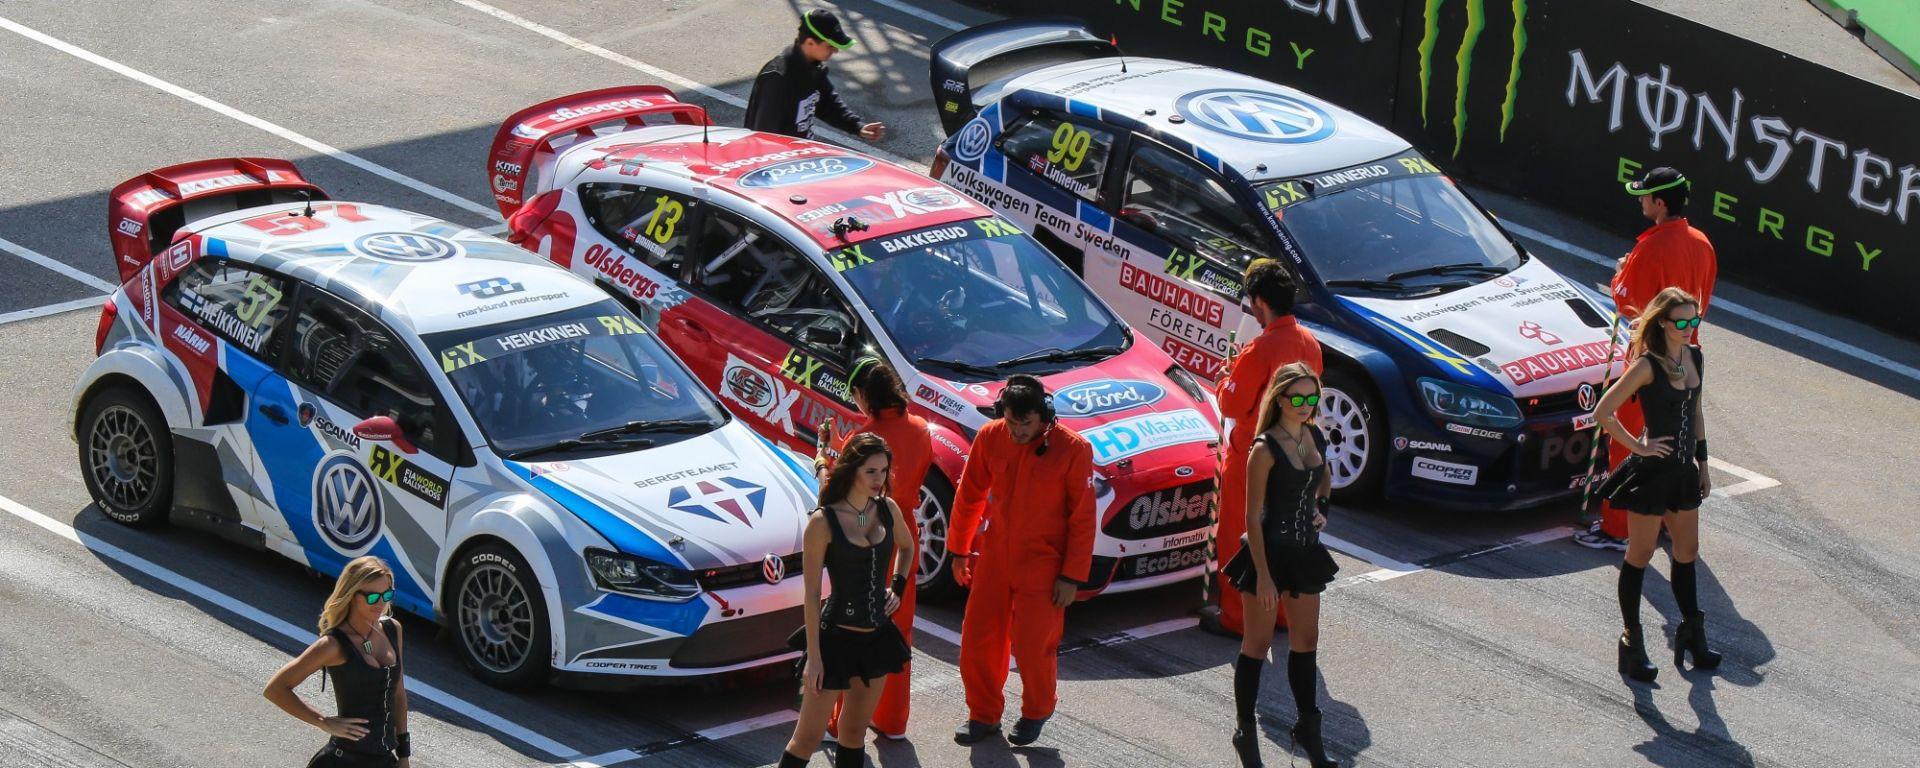 Campionato Mondiale Rallycross: il calendario 2016